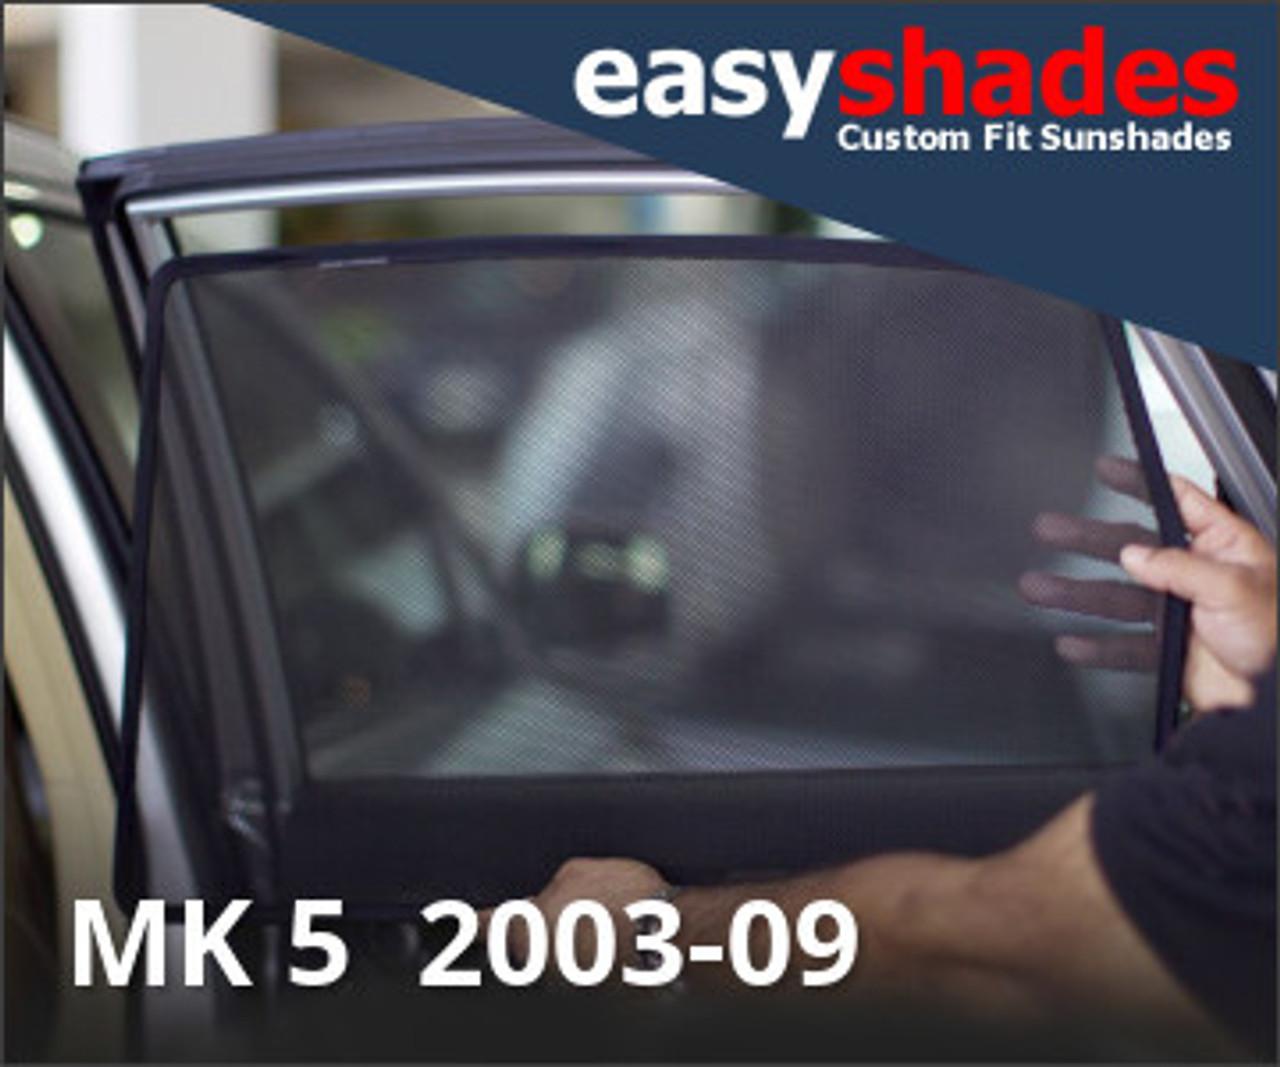 MK 5 2003-09